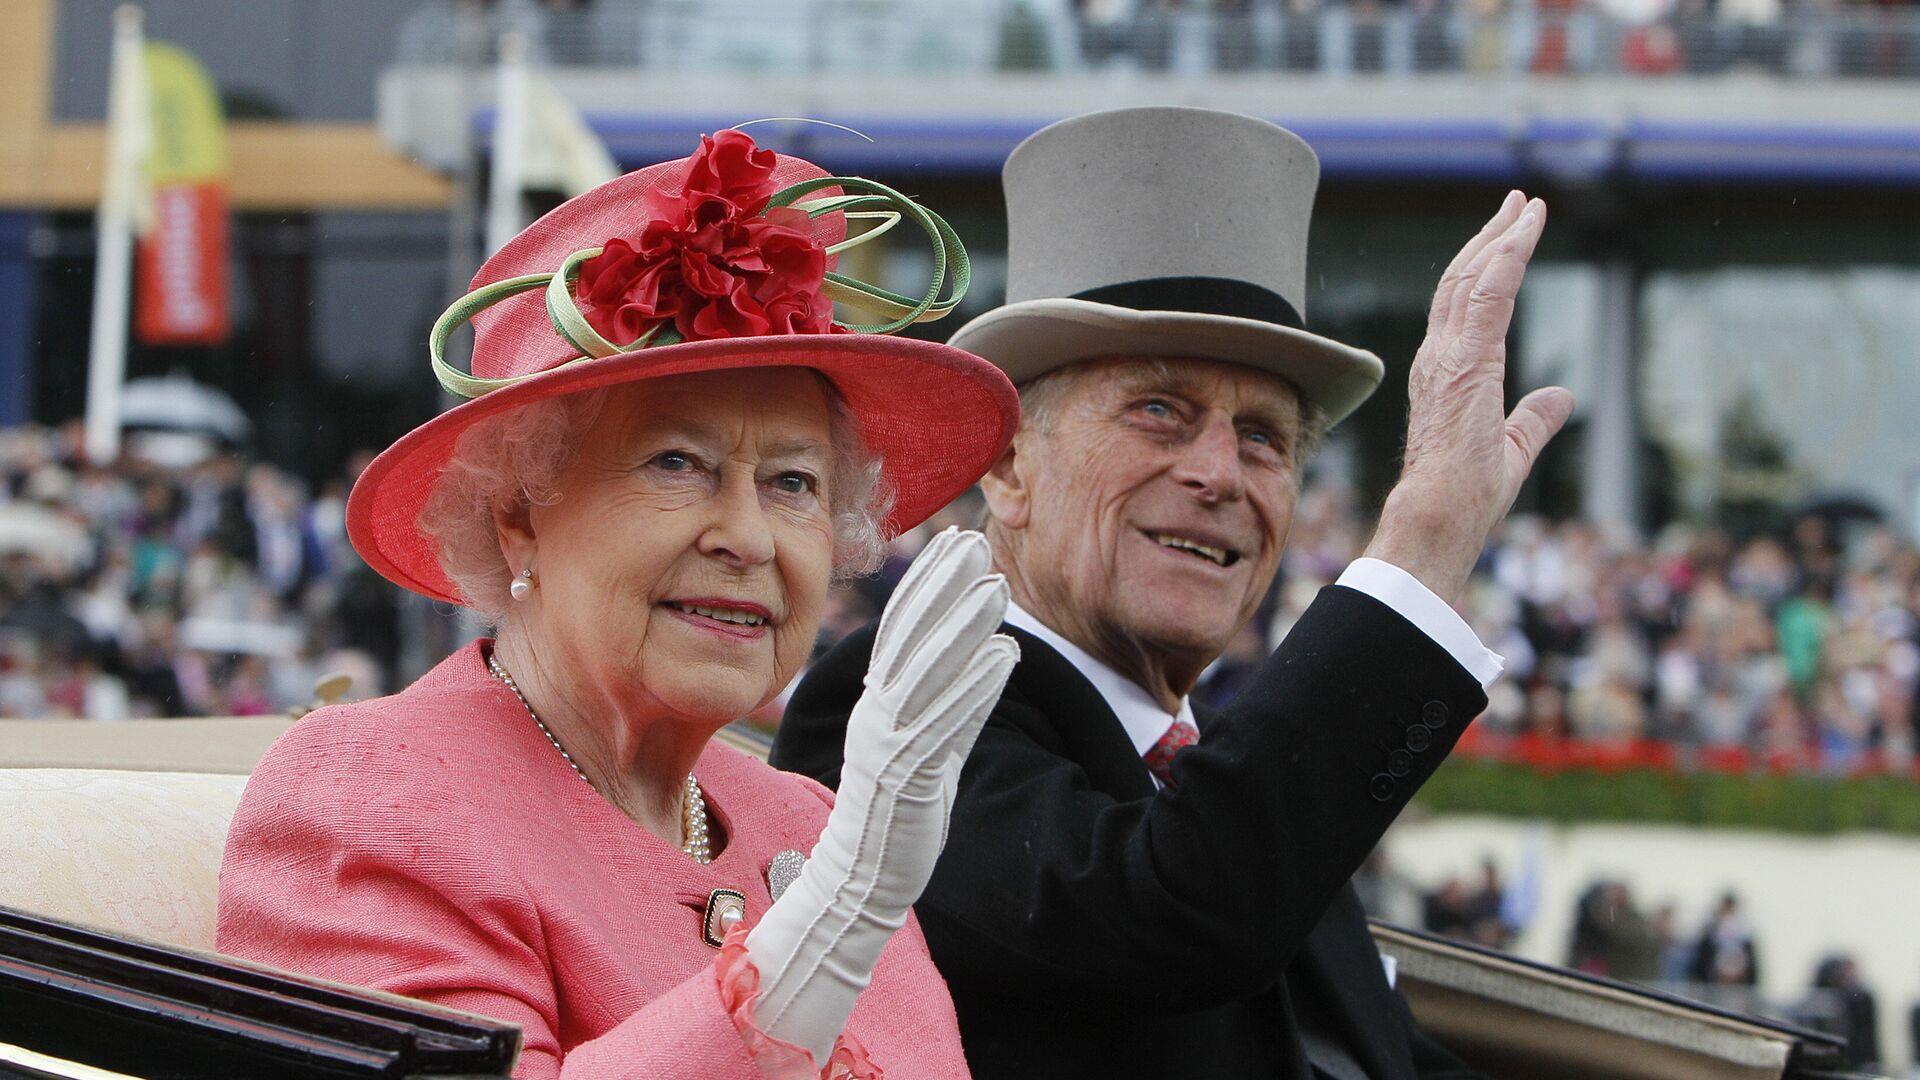 Королева Великобритании Елизавета II и принц Филипп прибыли на скачки Royal Ascot в Аскоте - РИА Новости, 1920, 17.02.2021